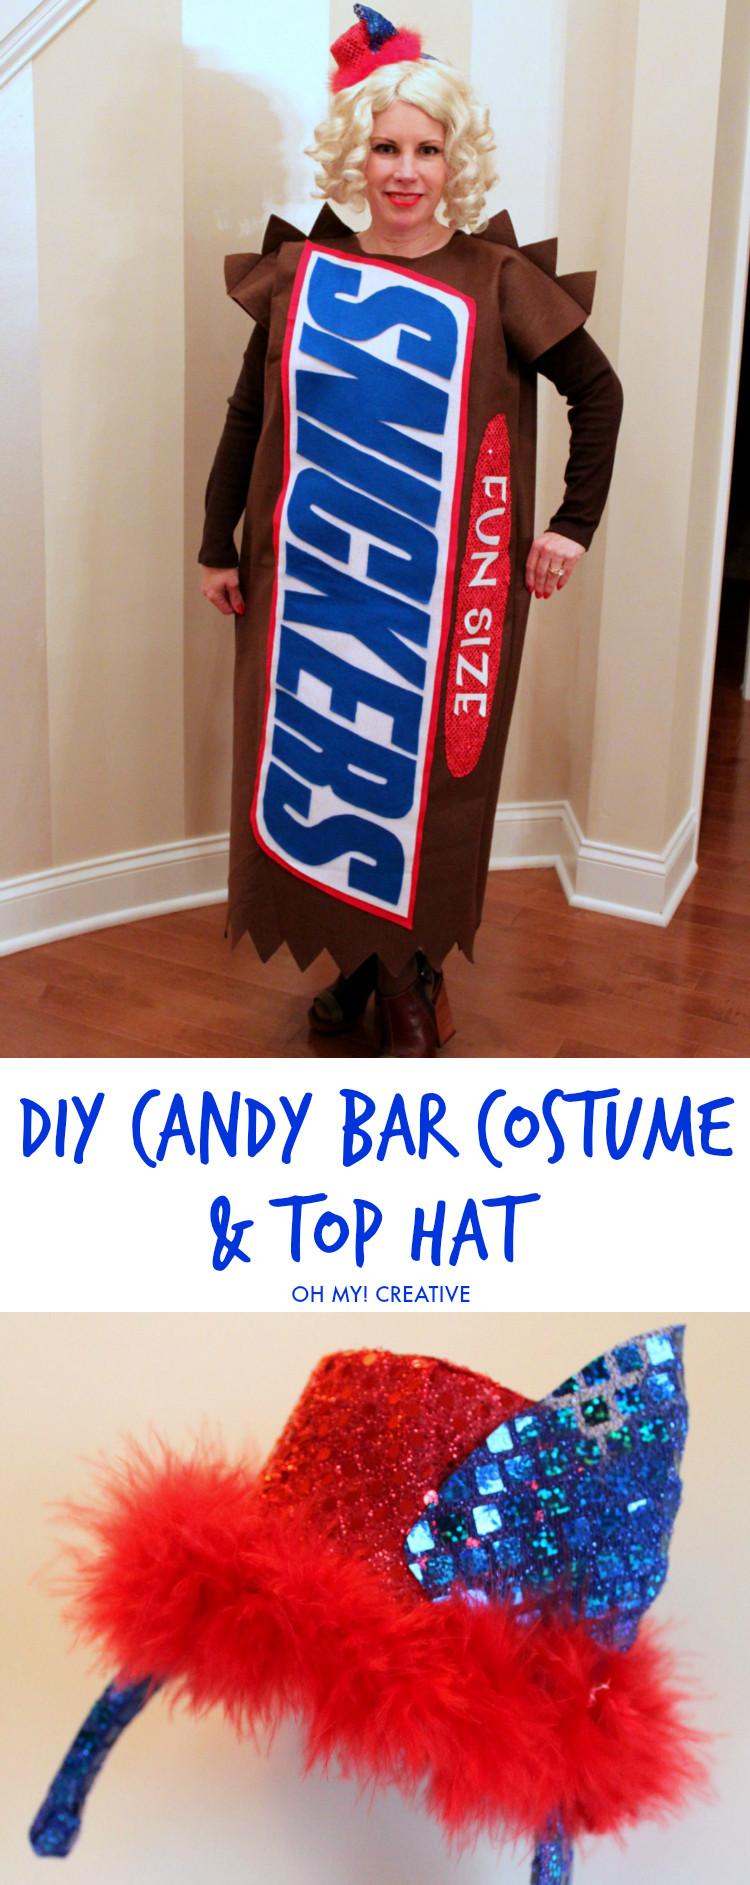 DIY Candy Costume  DIY Candy Bar Halloween Costumes Oh My Creative